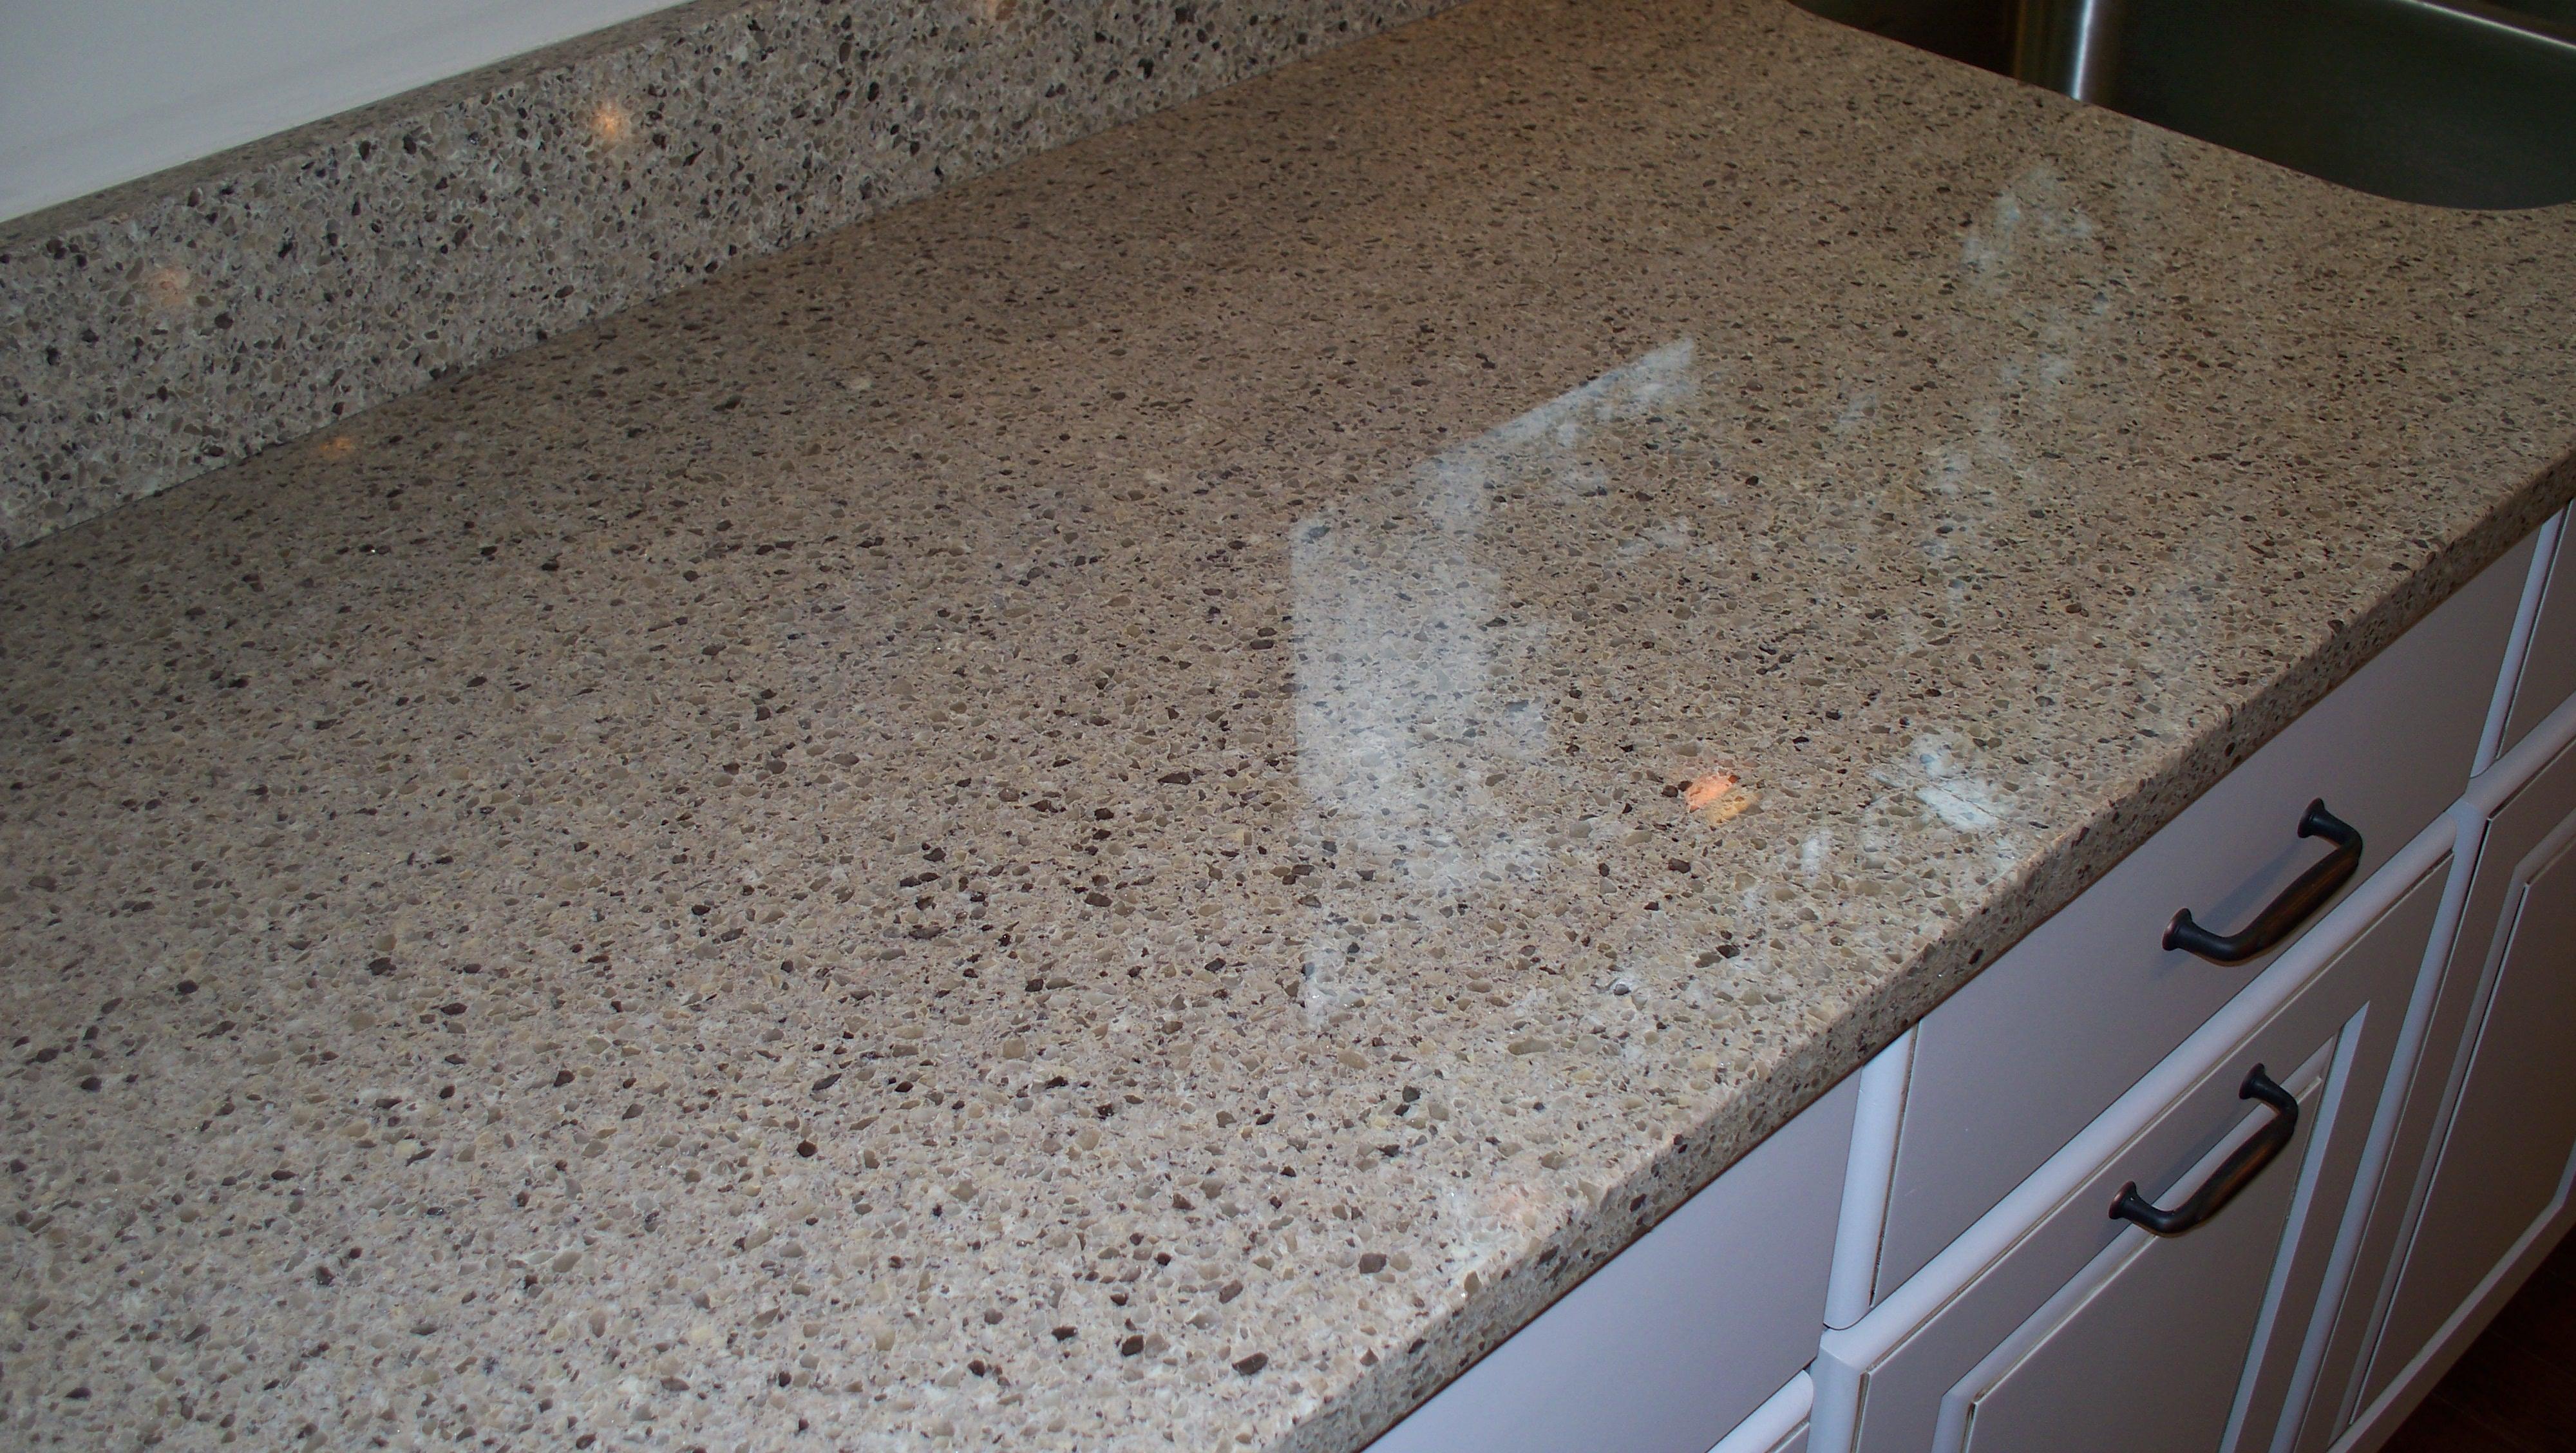 Quartz countertop seam repair kalamazoo mi granite m d for Seamless quartz countertops